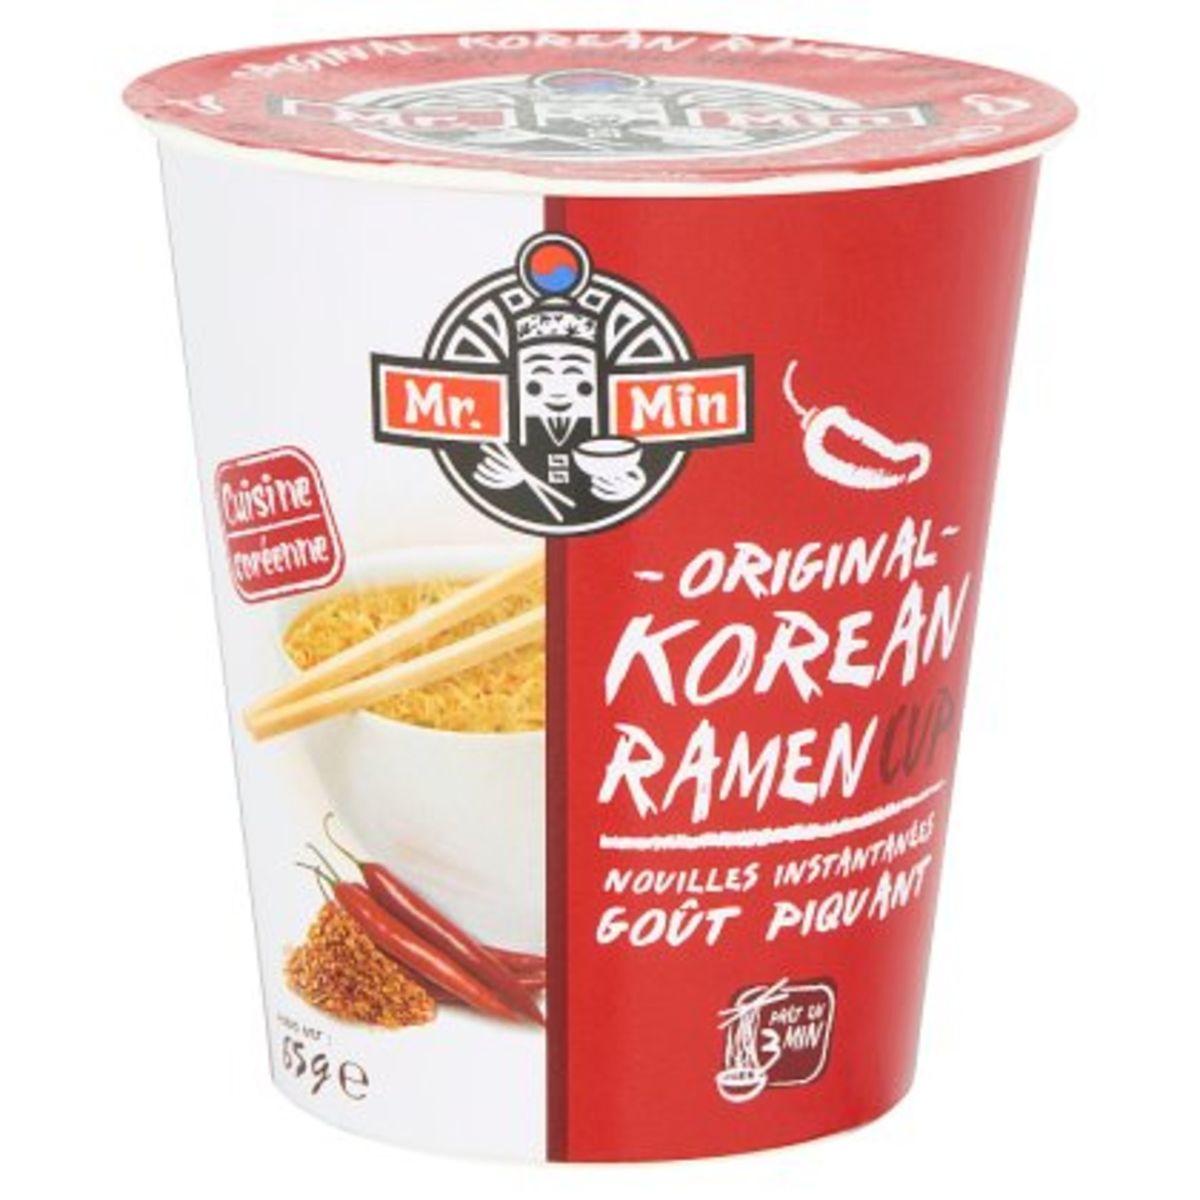 Mr. Min Original Korean Ramen Cup Noodles Instant Pikant 65 g